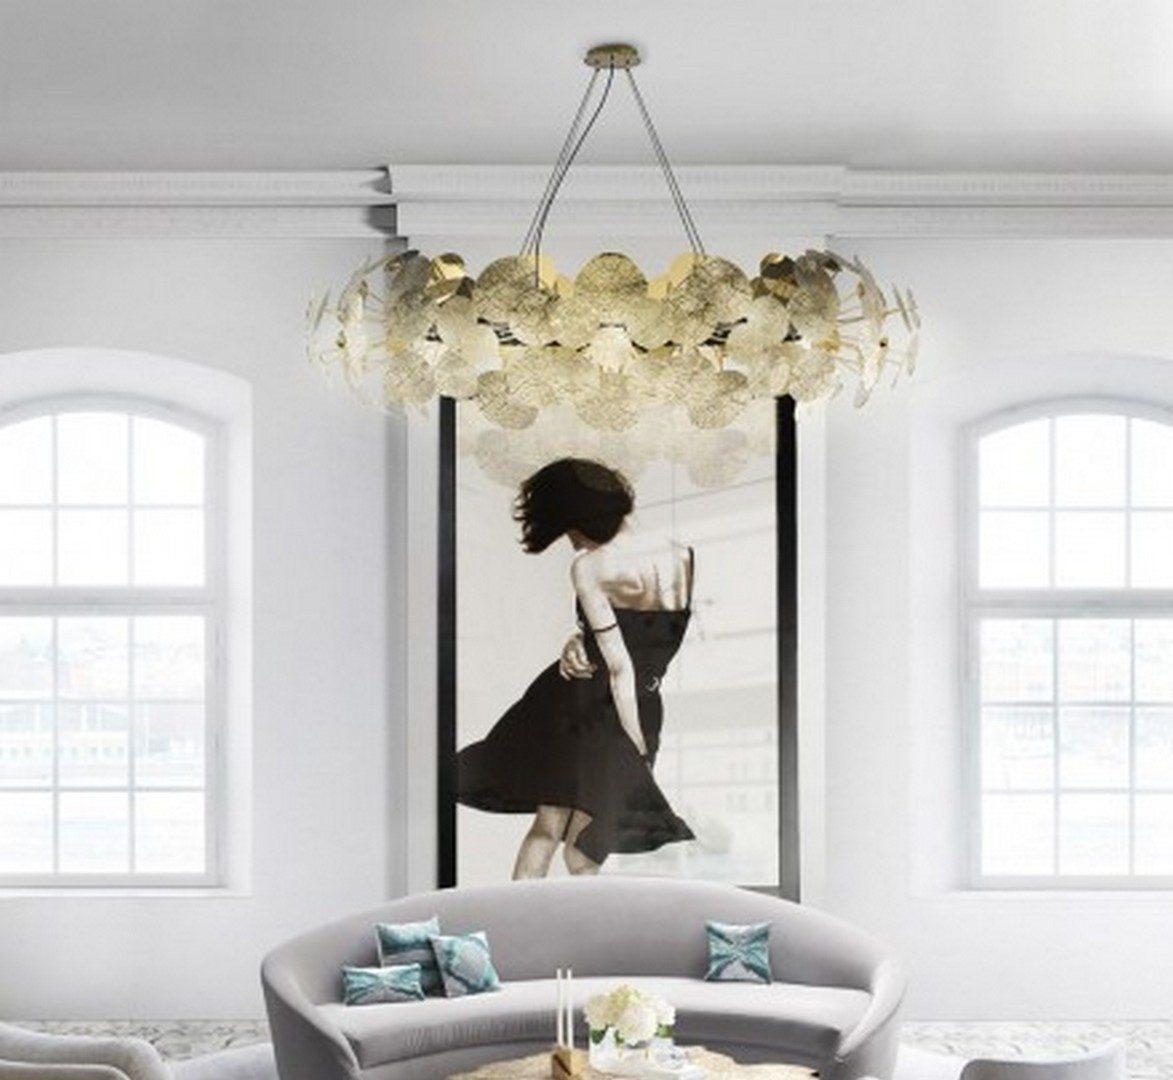 Candelabros elegantes: Piezas exclusivas para un proyecto lujuoso candelabros elegantes Candelabros elegantes: Piezas exclusivas para un proyecto lujuoso newton chandelier by boca do lobo 1 e1610106769350